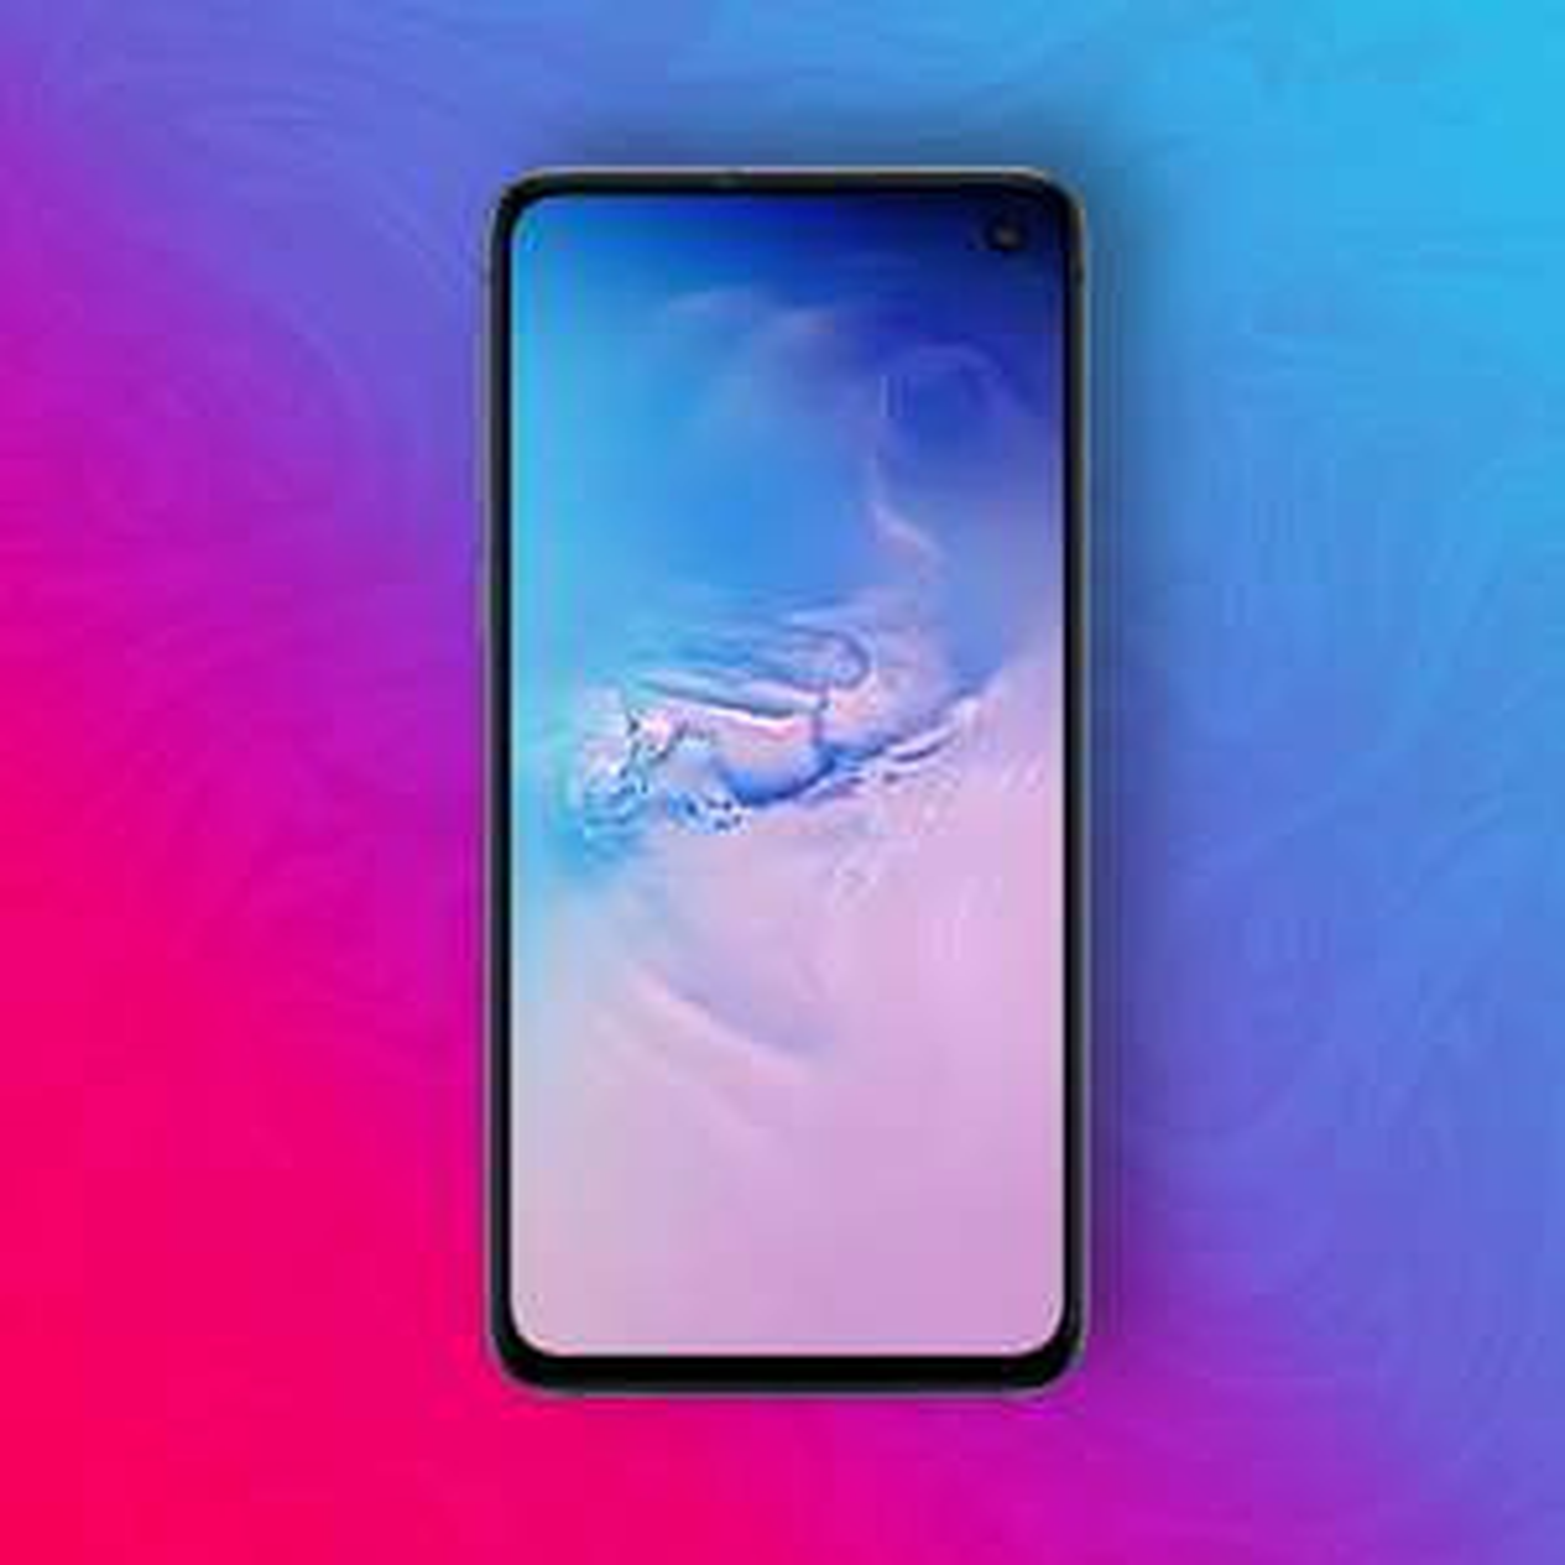 "Samsung Galaxy S10e 128/6GB - 5,8"" Super Amoled - Exynos 9820 - 12MP/16MP [Amazon Prime]"